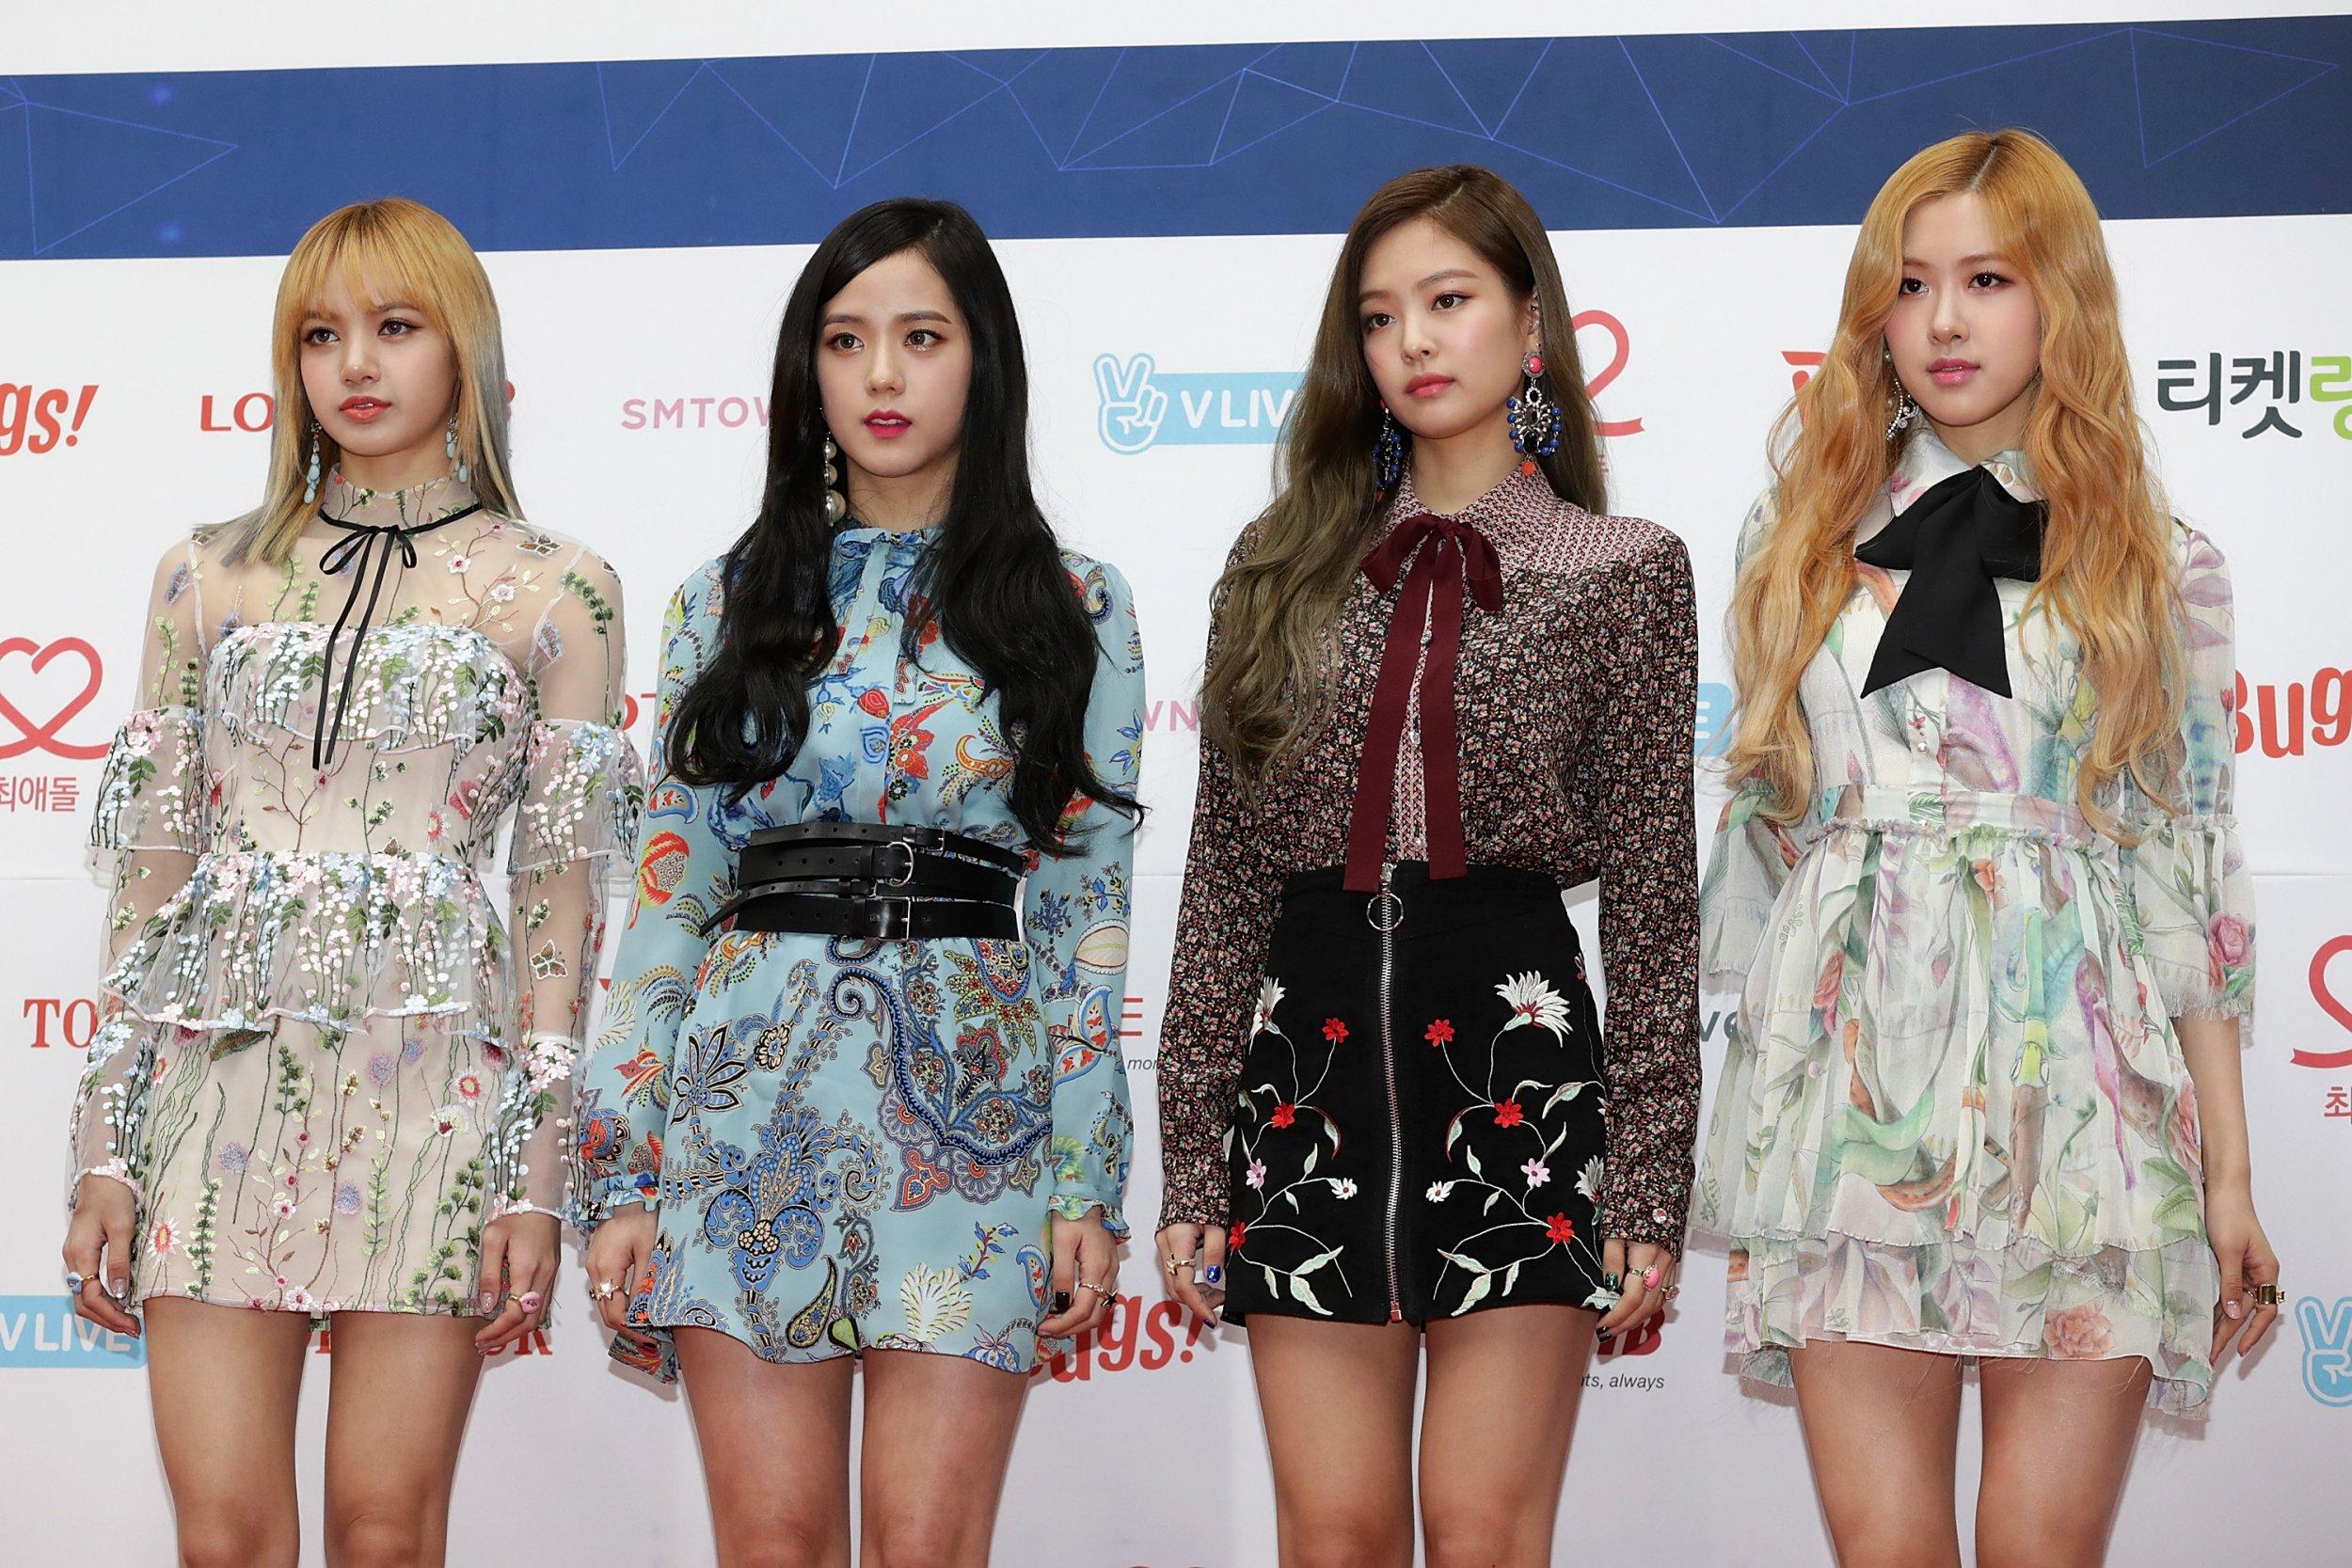 SEOUL, SOUTH KOREA - FEBRUARY 22: Girl group BLACKPINK attend the 6th Gaon Chart K-Pop Awards on February 22, 2017 in Seoul, South Korea. (Photo by Han Myung-Gu/WireImage)